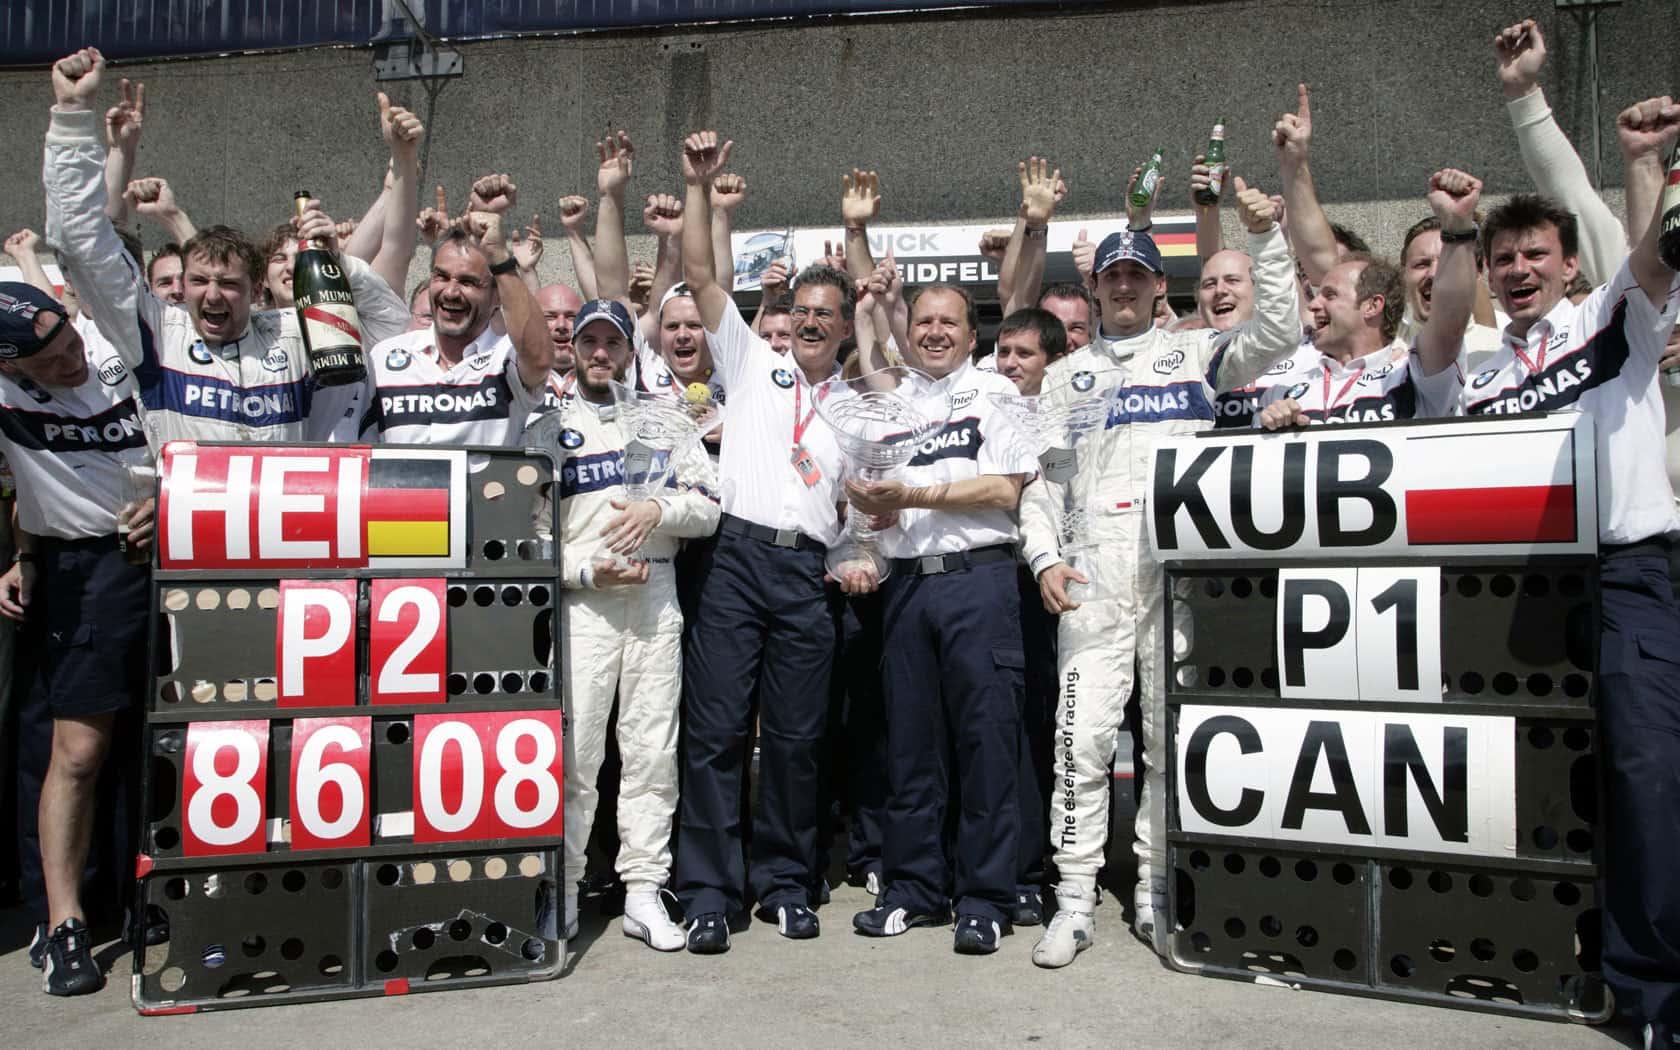 Canada F1 2008 podium Kubica Heidfeld Foto F1fansite